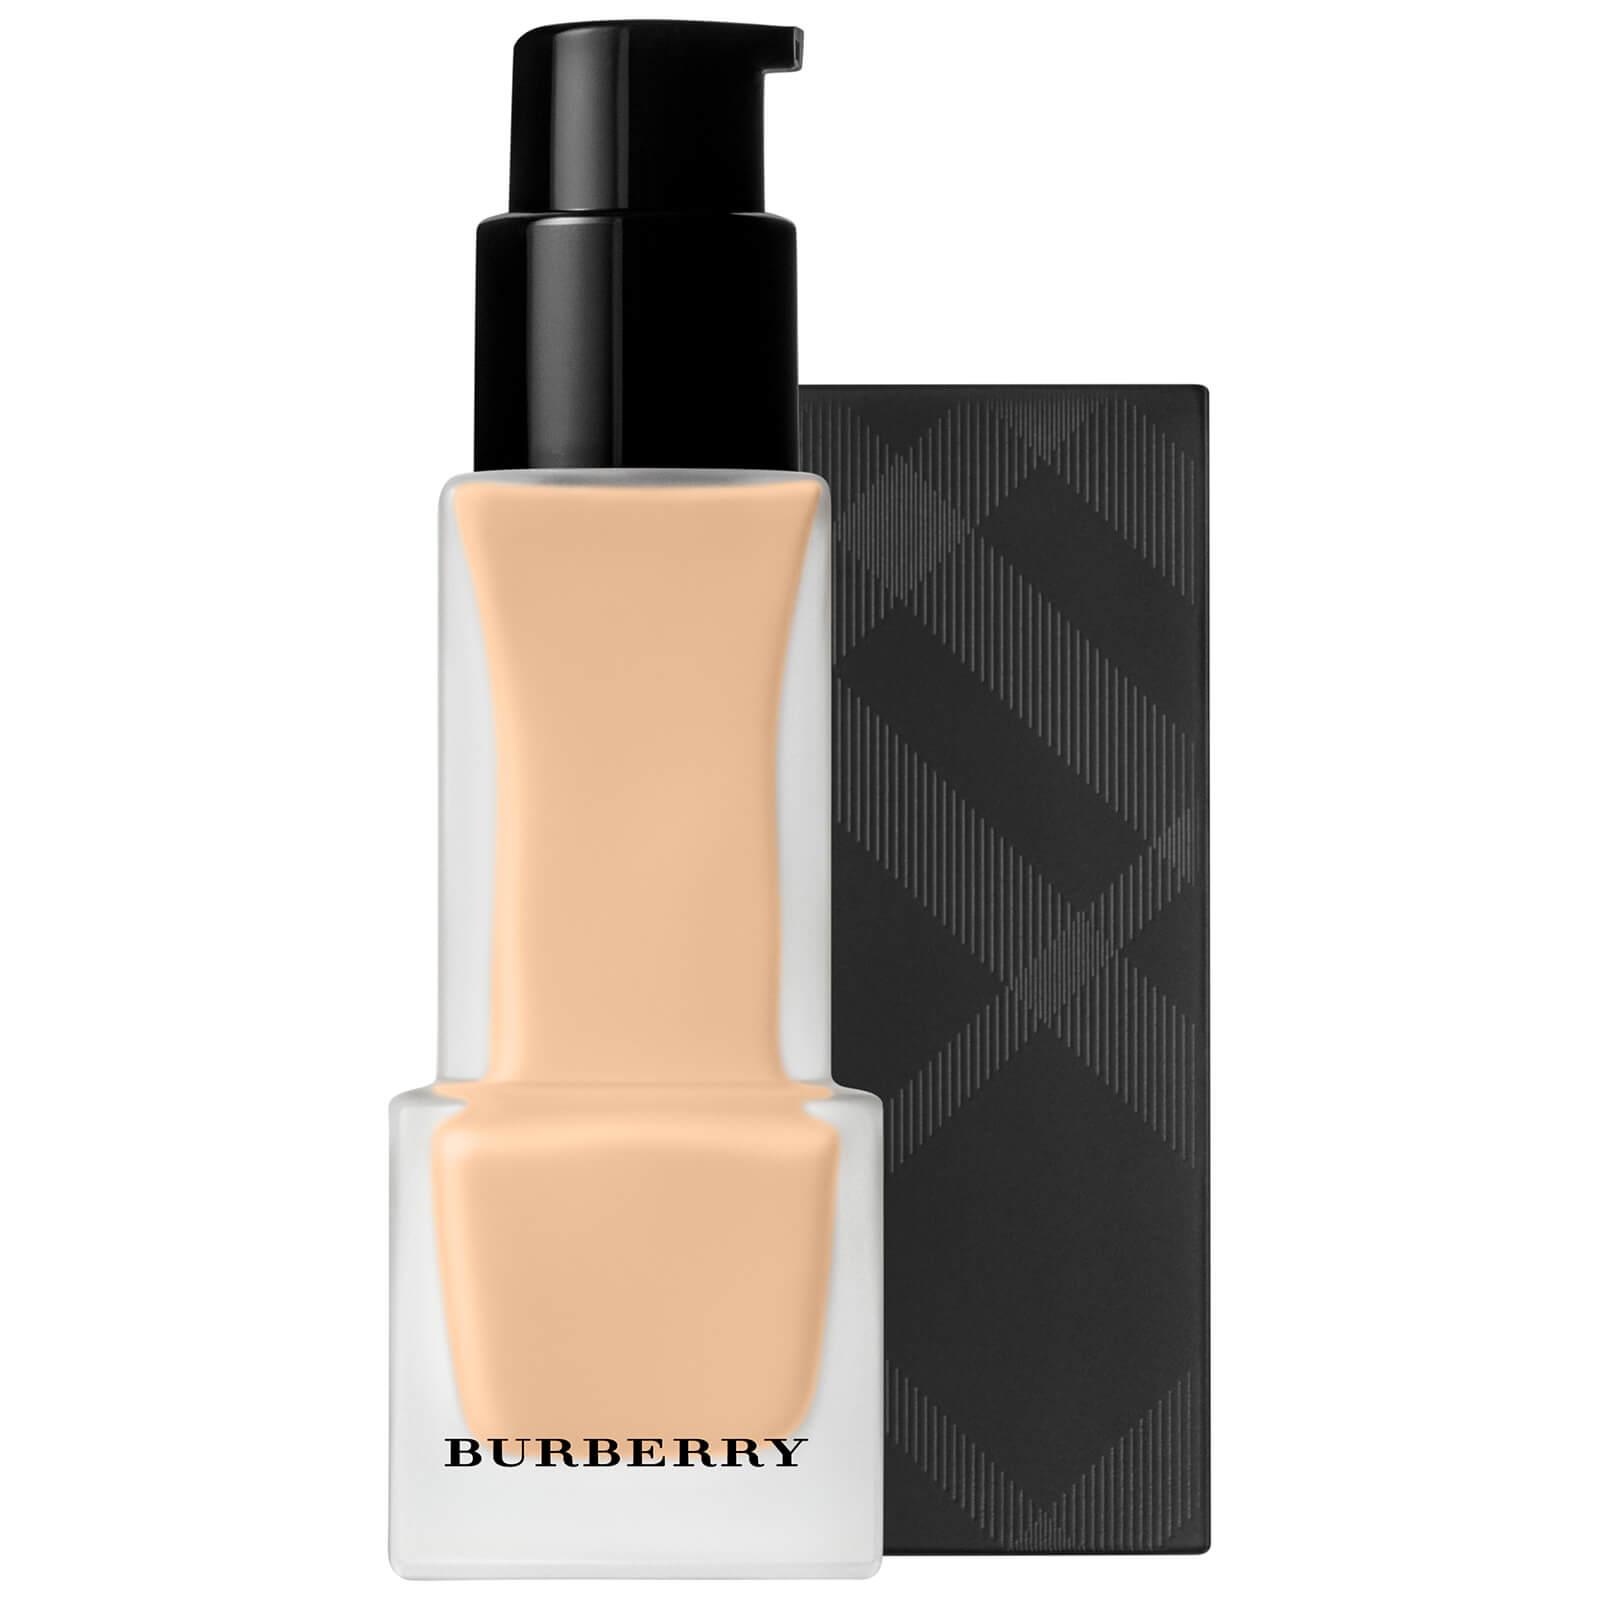 Burberry Matte Glow Fluid Foundation 30ml (Various Shades) - 20 Fair Cool